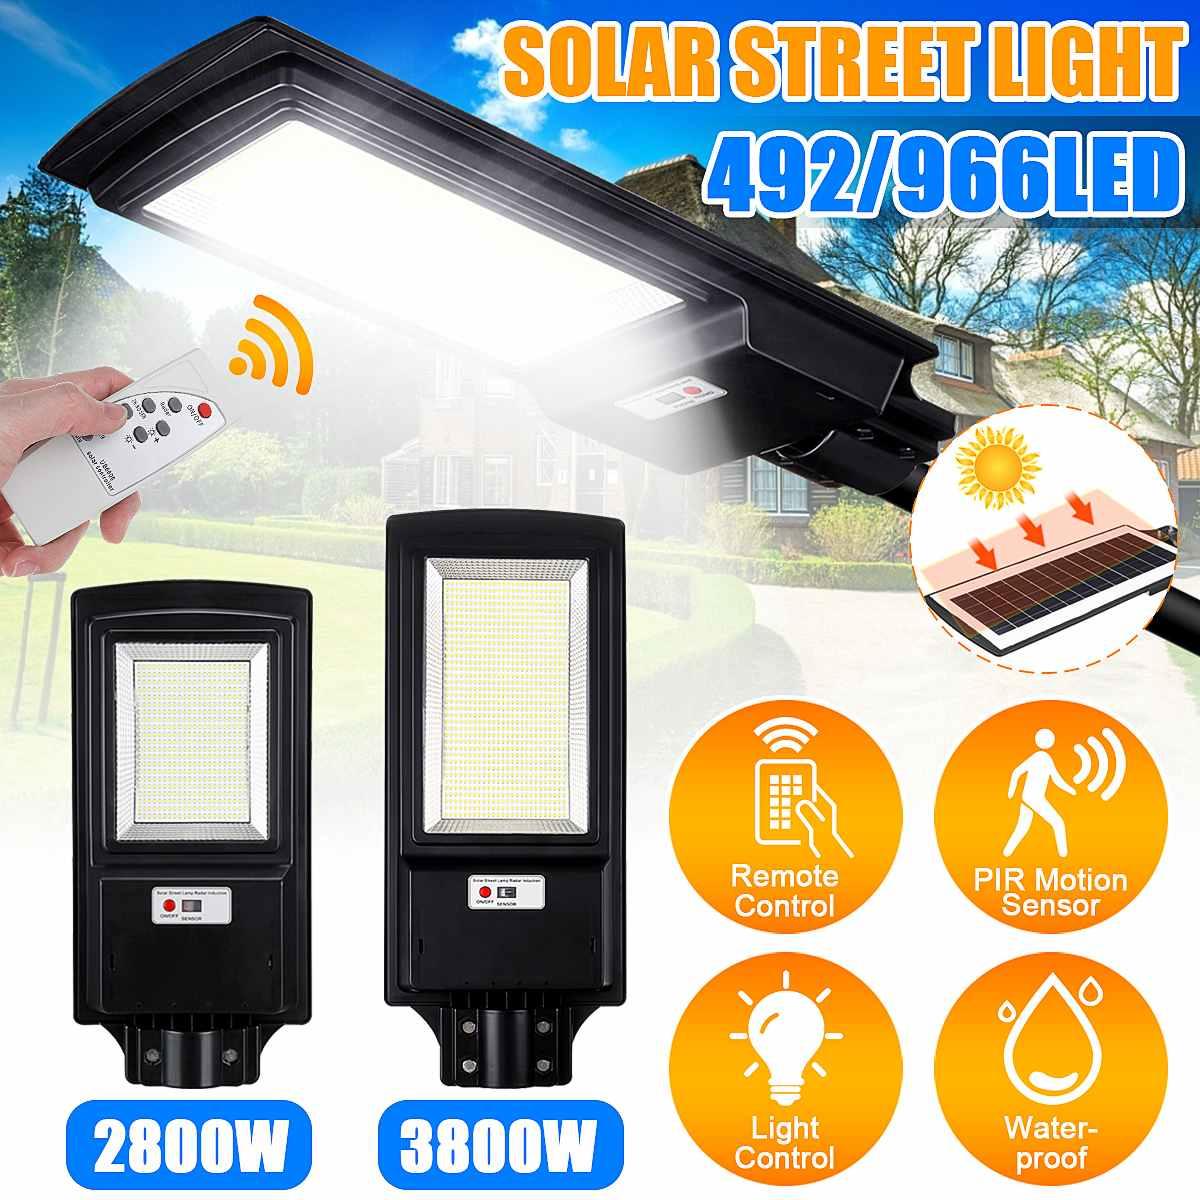 2800W 3800W LED Solar Street Light with Remote Control 8500K Radar Sensor Outdoor Garden Wall Lamp Industrial Security Lighting